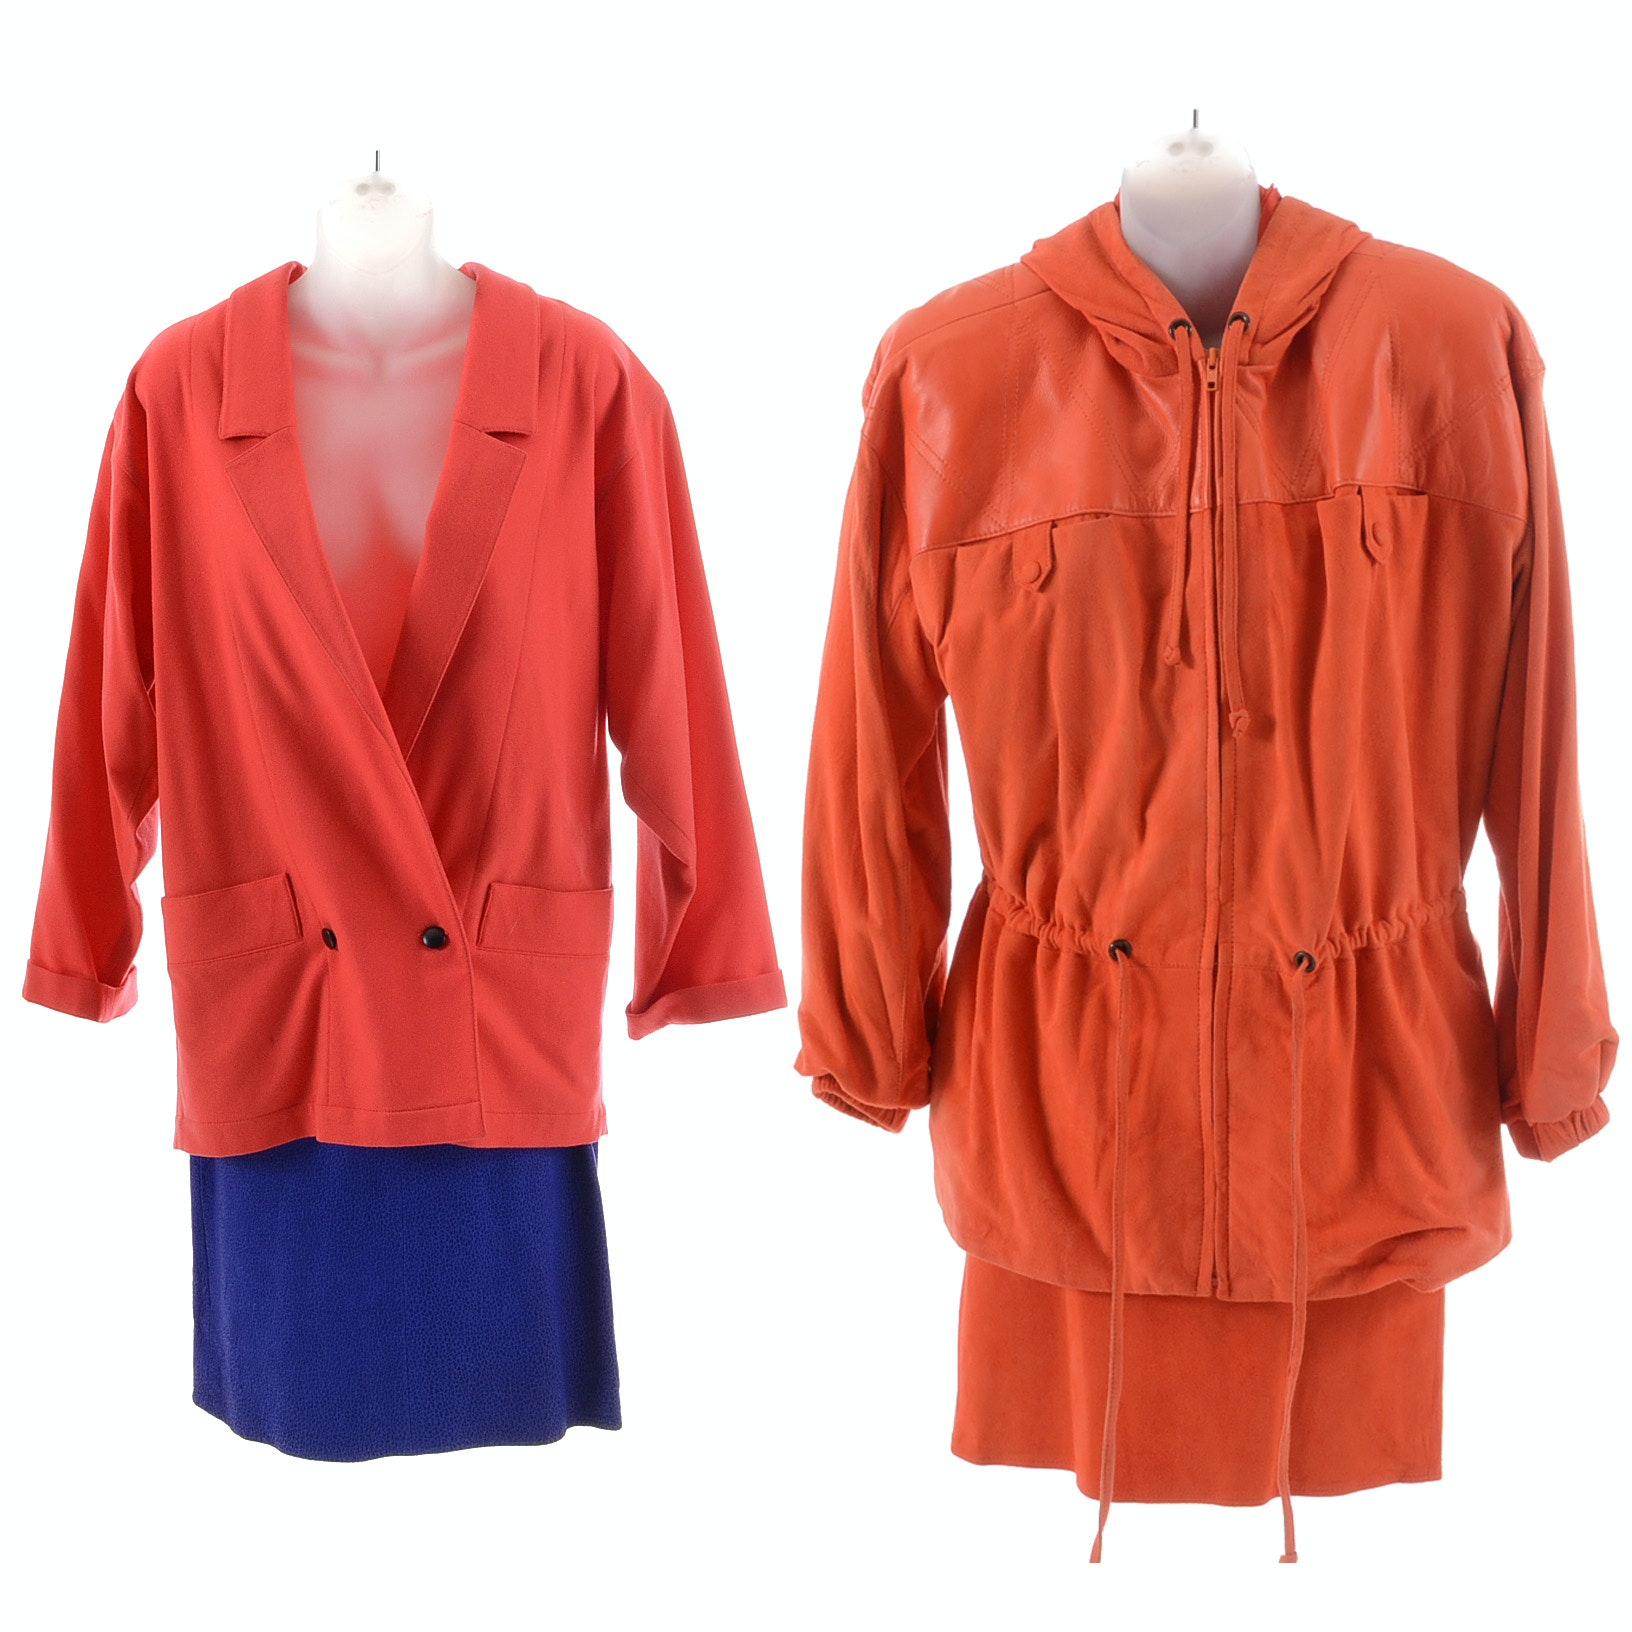 Assortment of Vintage Clothes